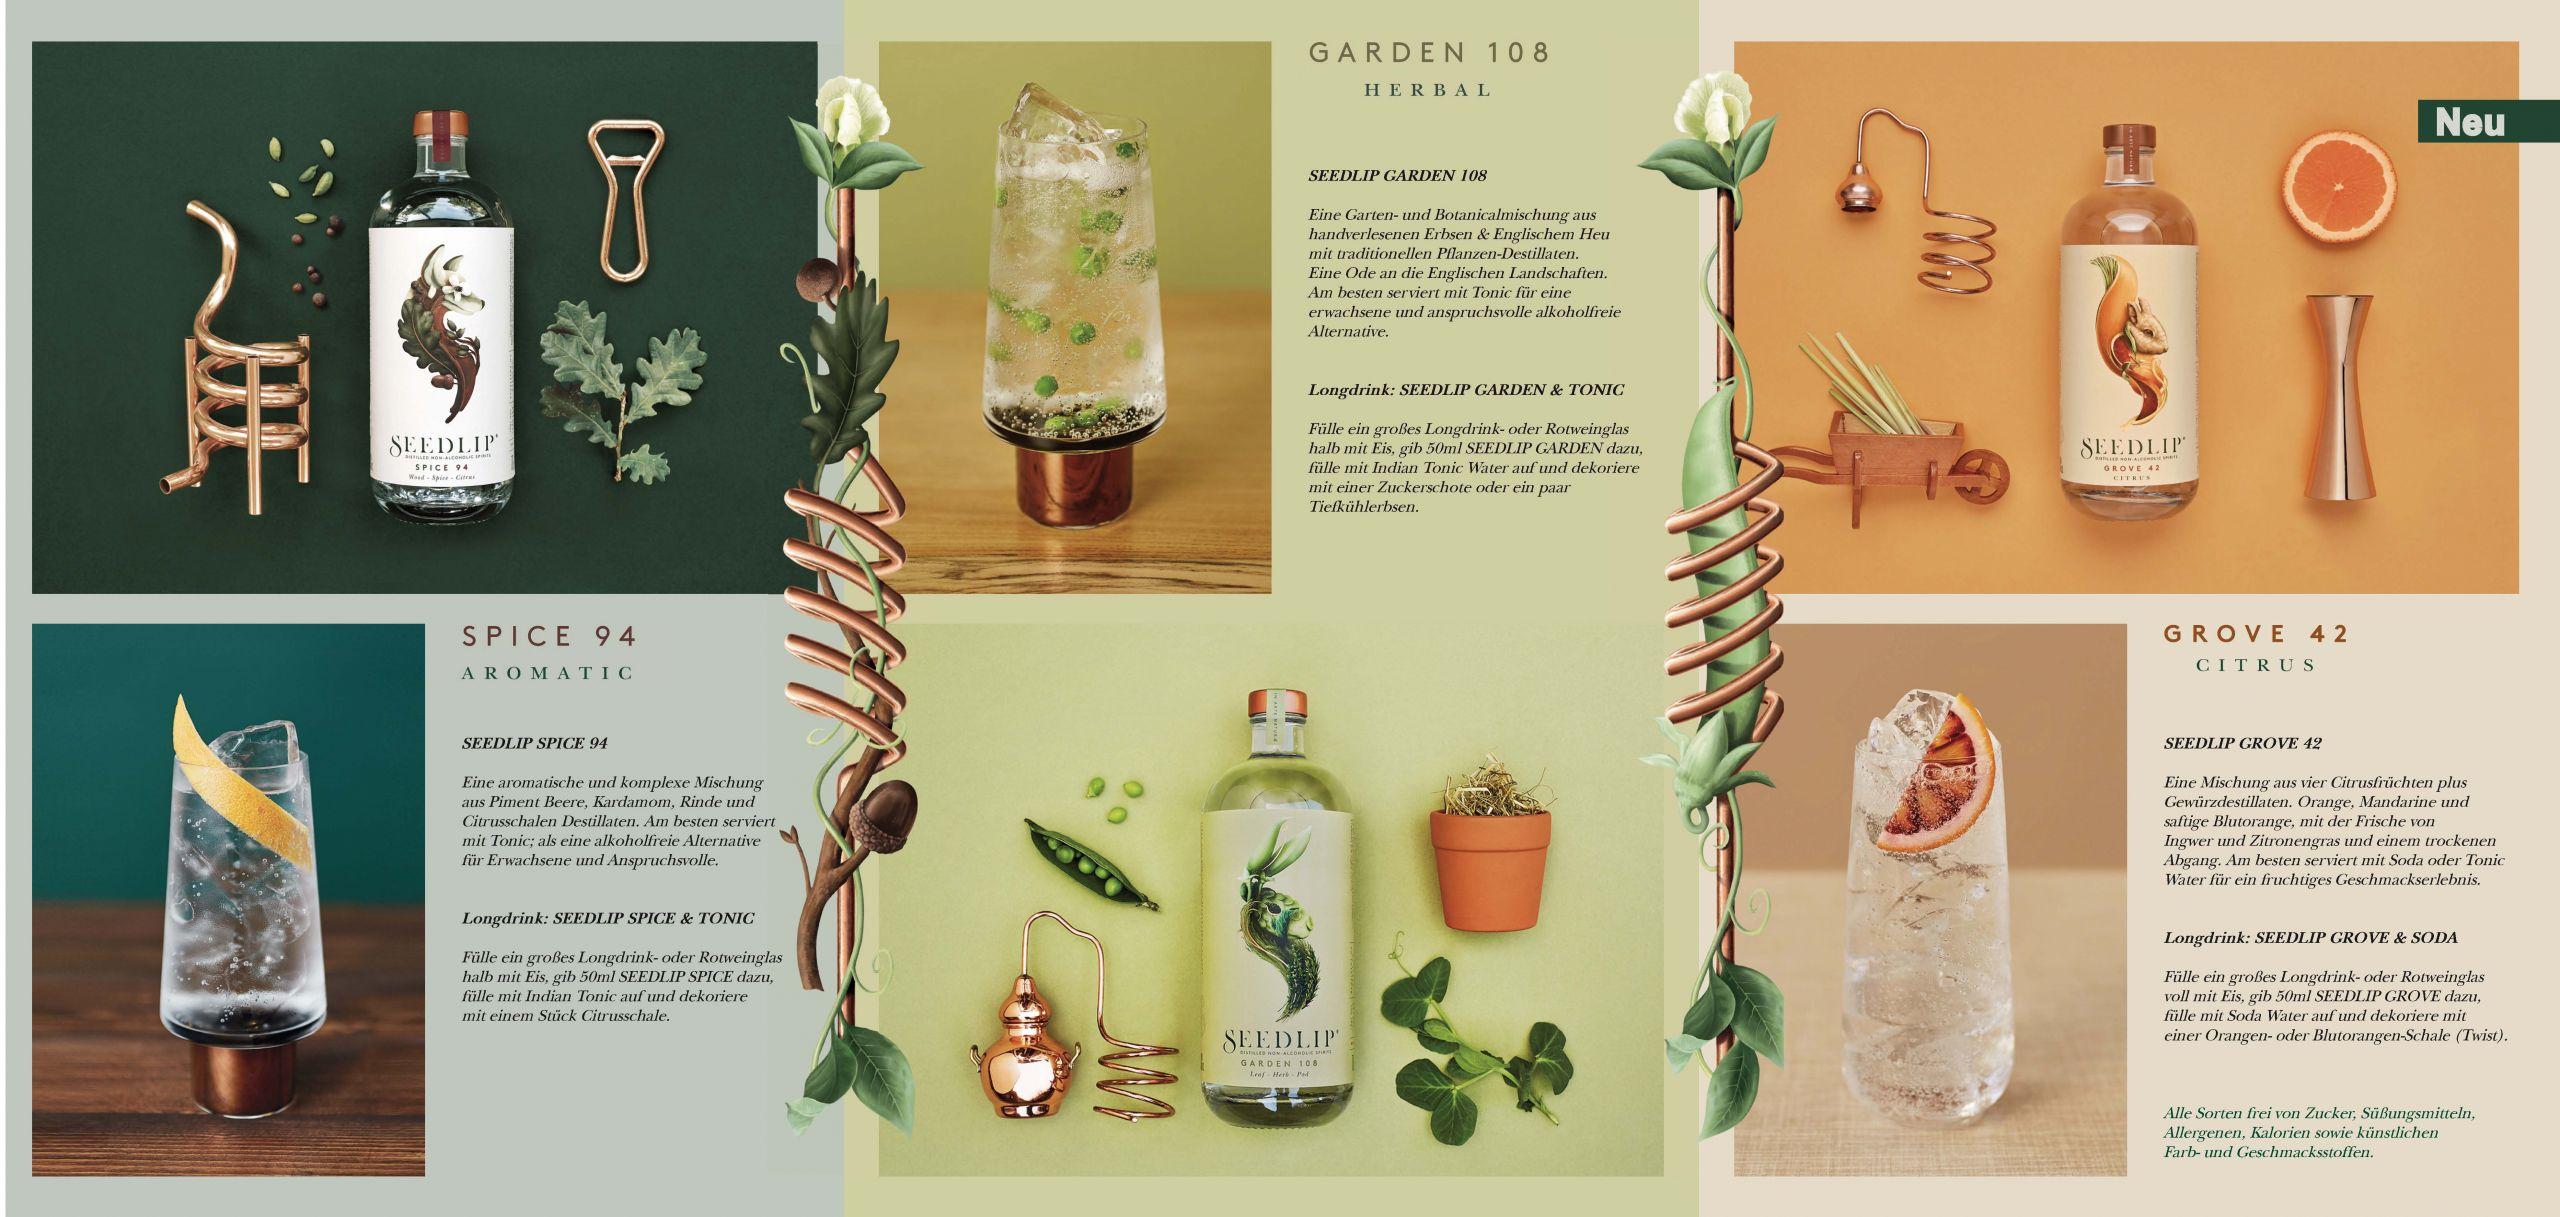 seedlip non alcoholic spirit grove 42 200ml pet flasche UrHm1WUzIrRG